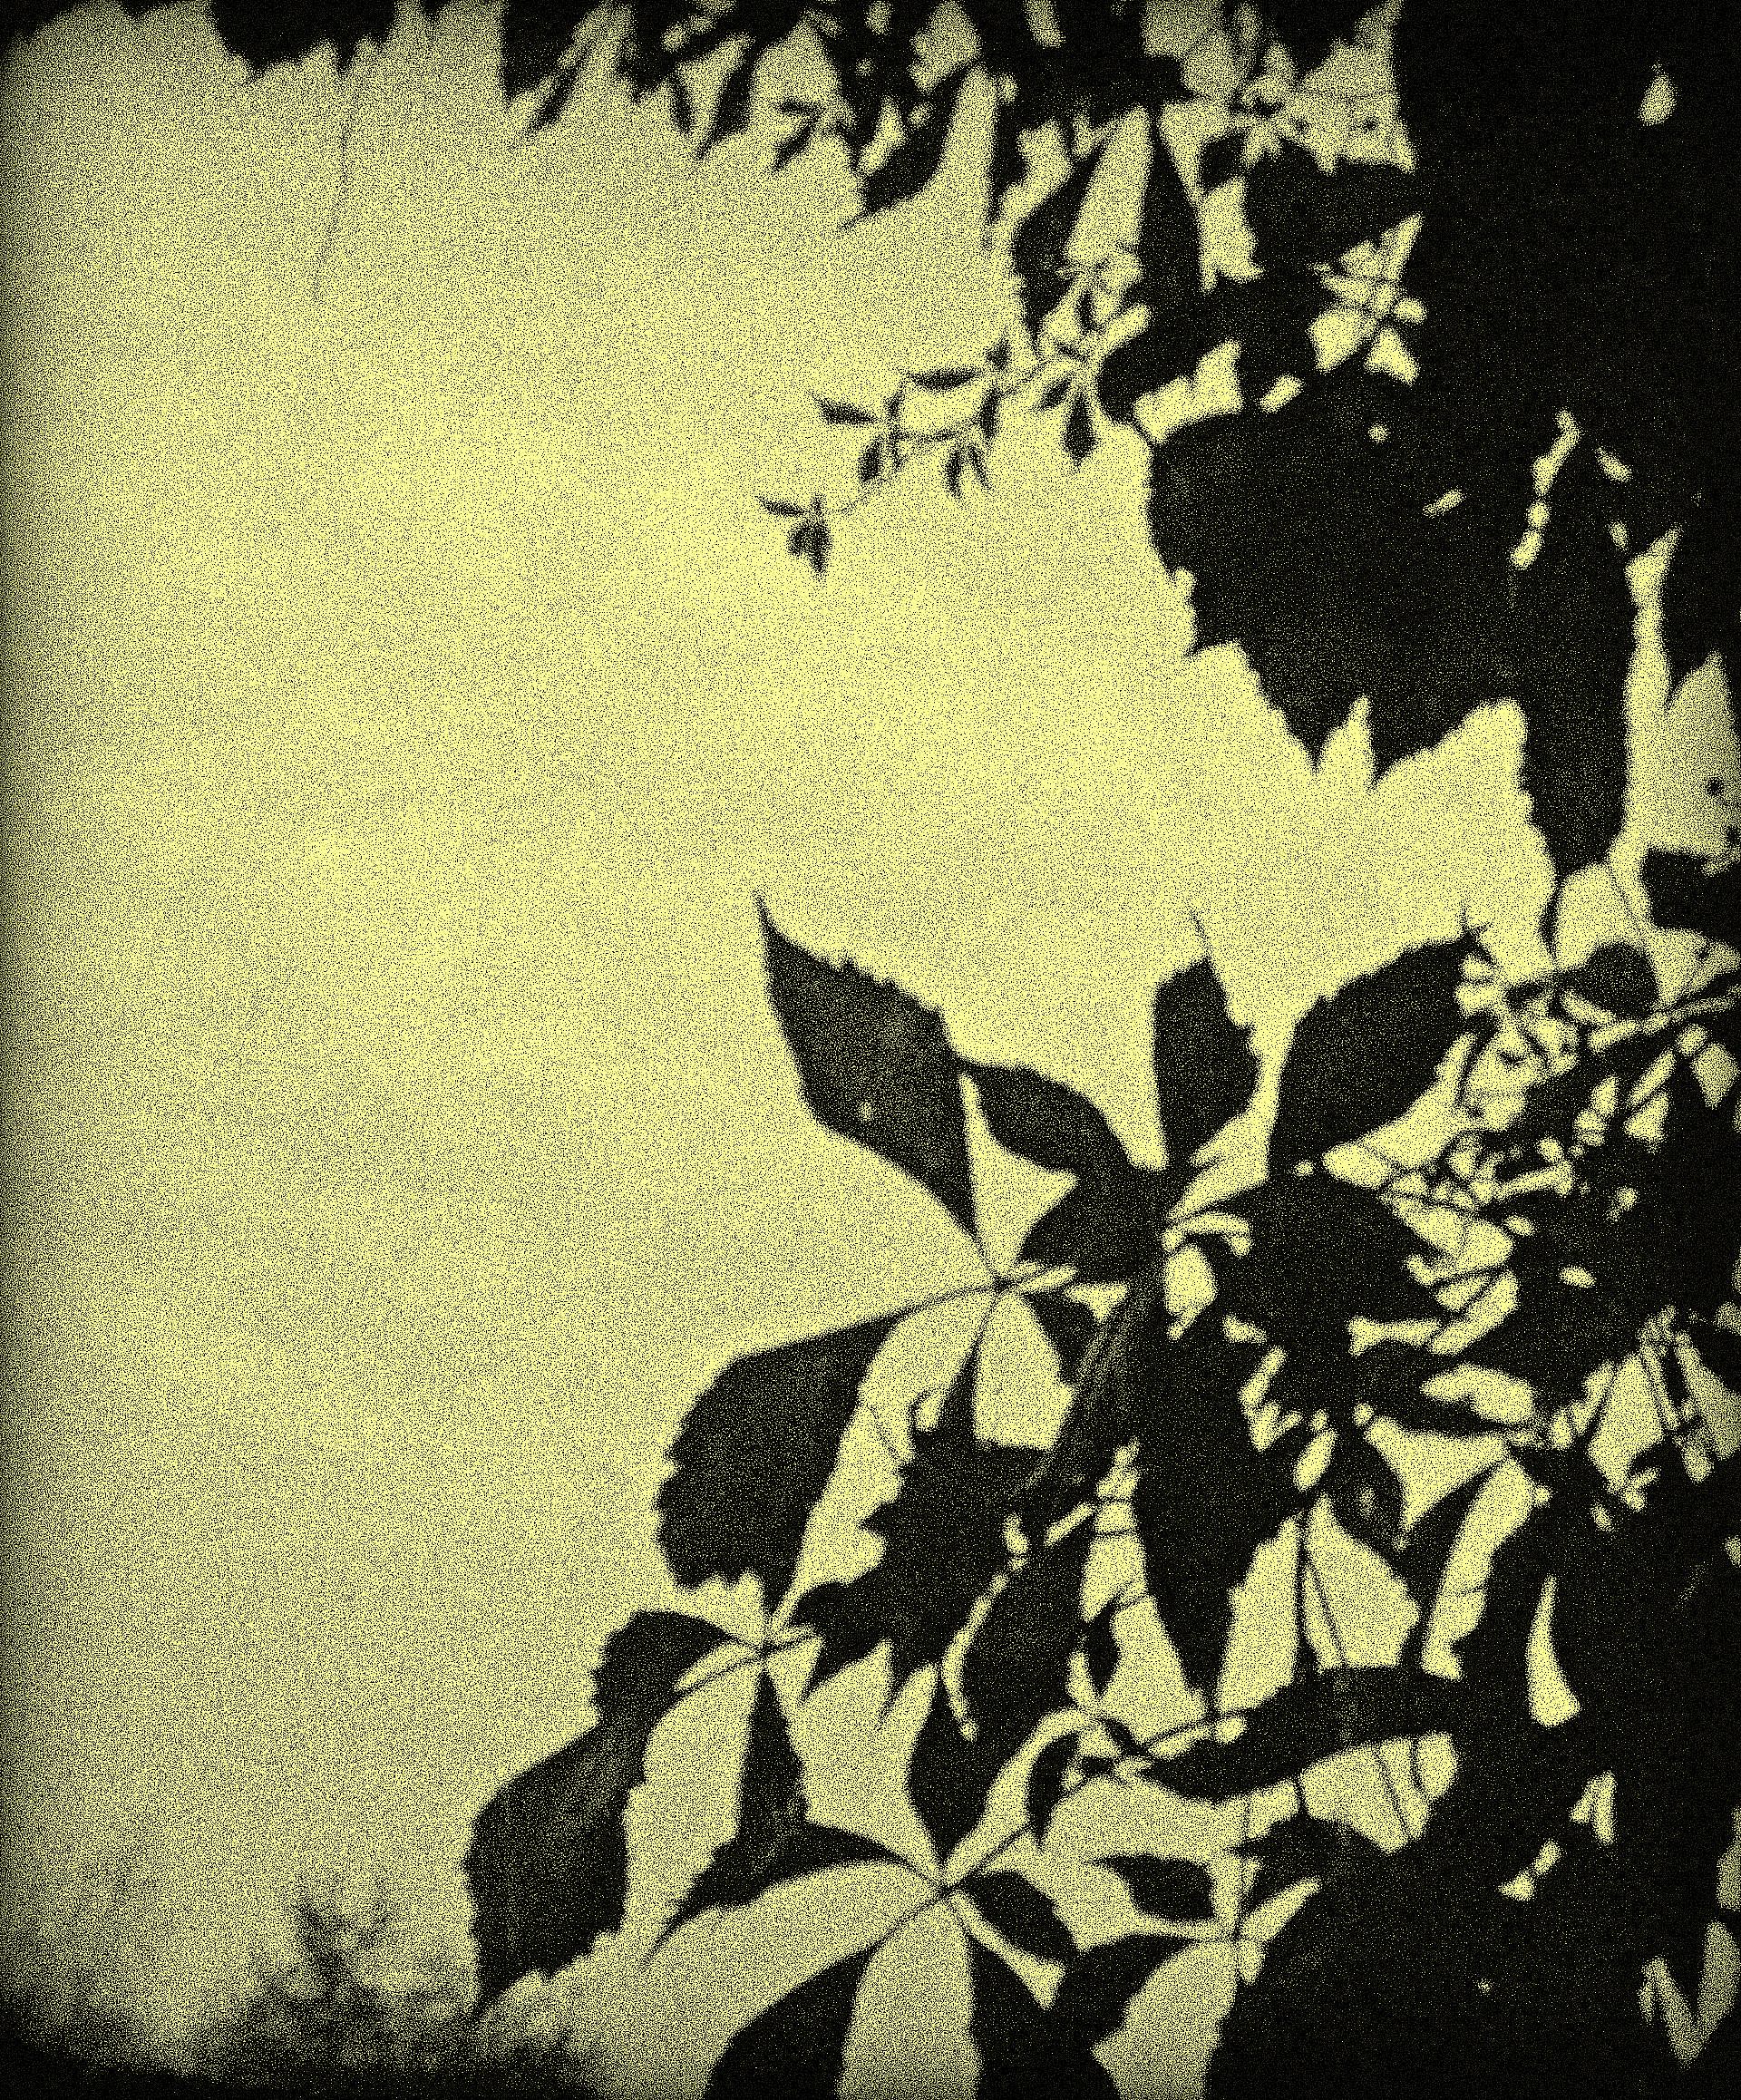 Gloomy Vine in Autumn by surrealistic-gloom